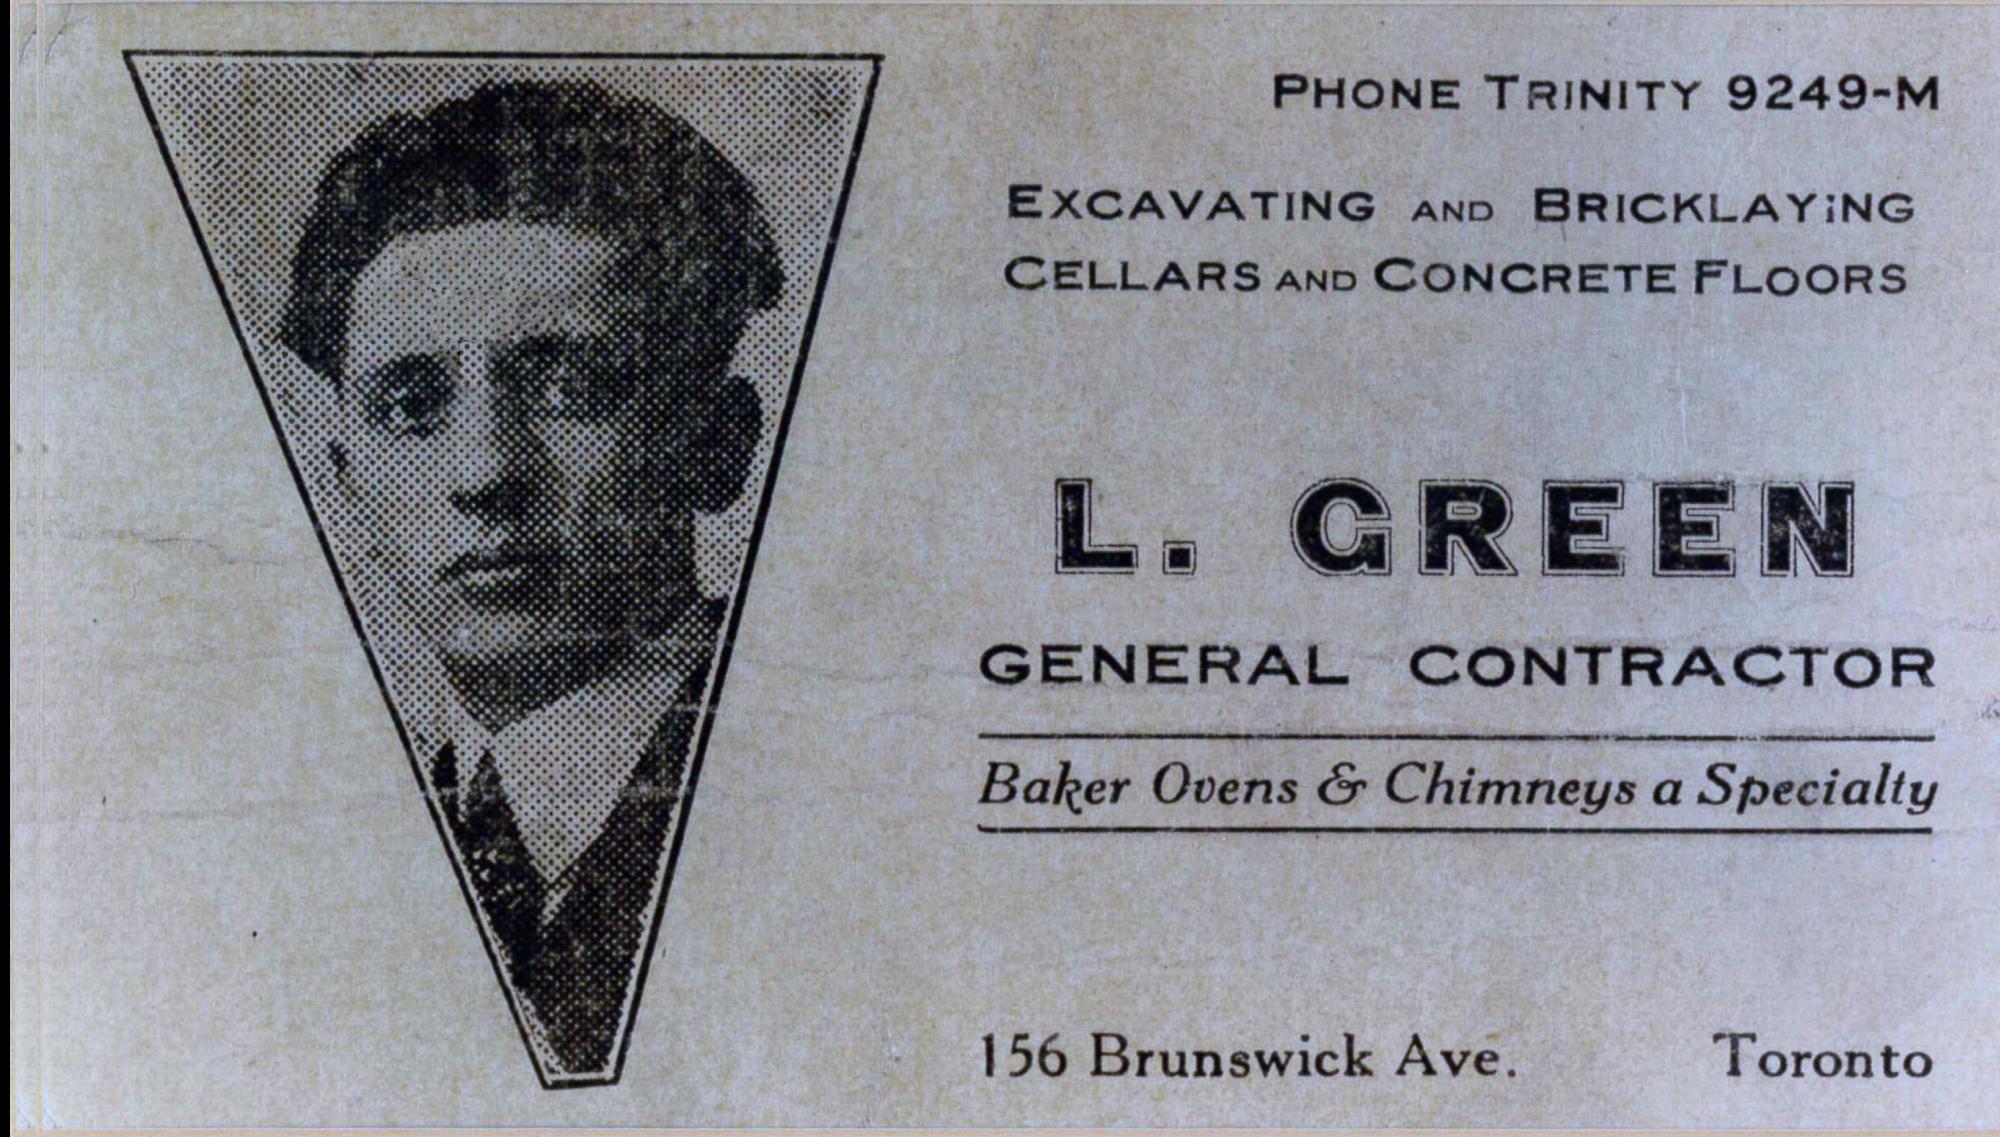 Louis Green business card